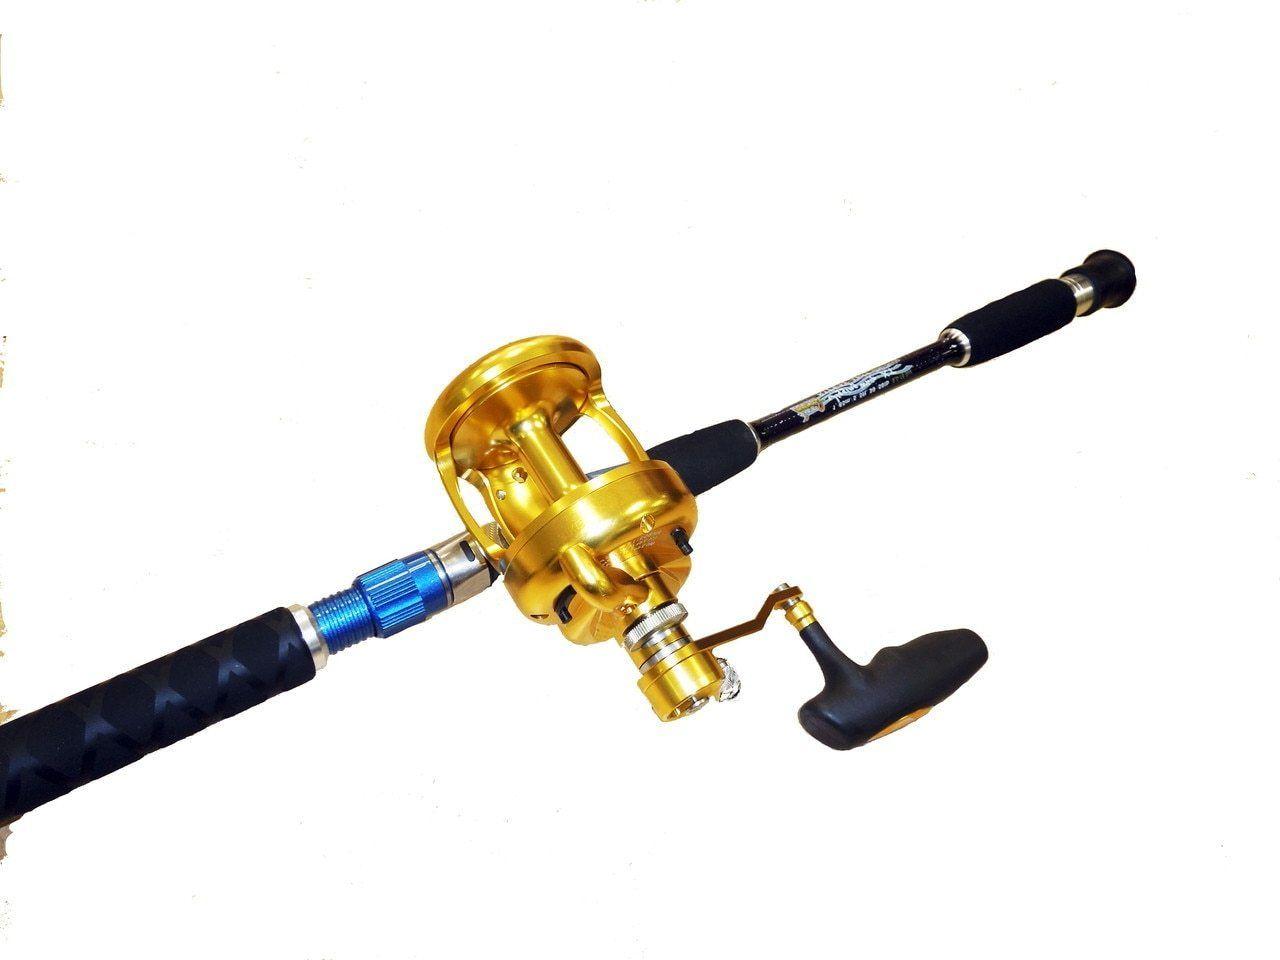 Pro Jigging Saltwater Rod Reel Combo Saltwater Lures Fishing Trip Rod And Reel